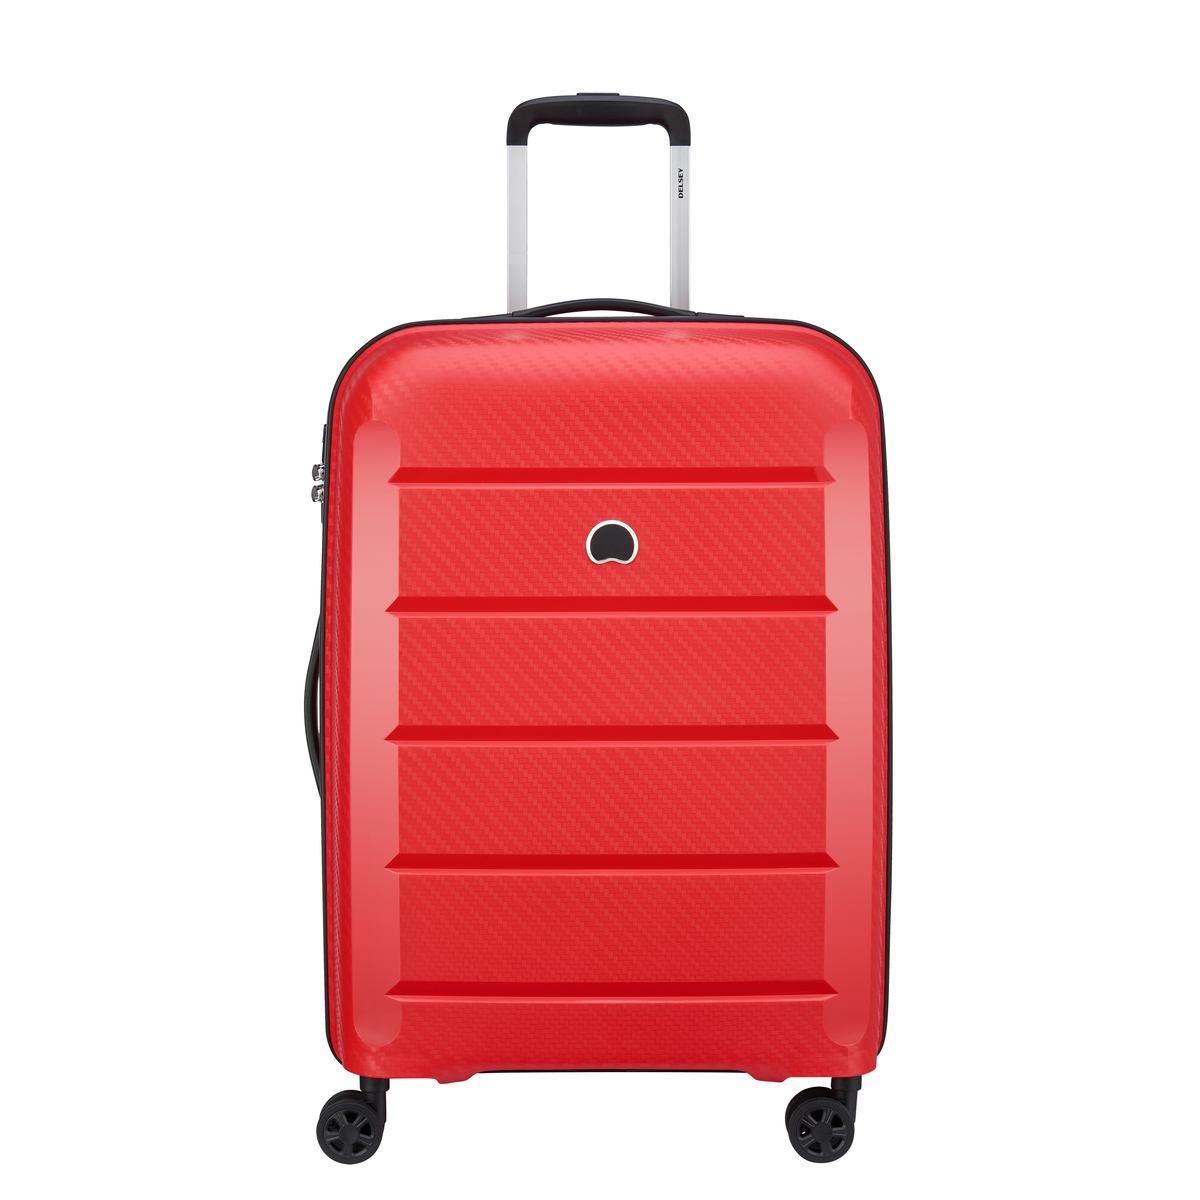 Delsey Βαλίτσα μεσαία 66x45x26.5cm σειρά Binalog Red